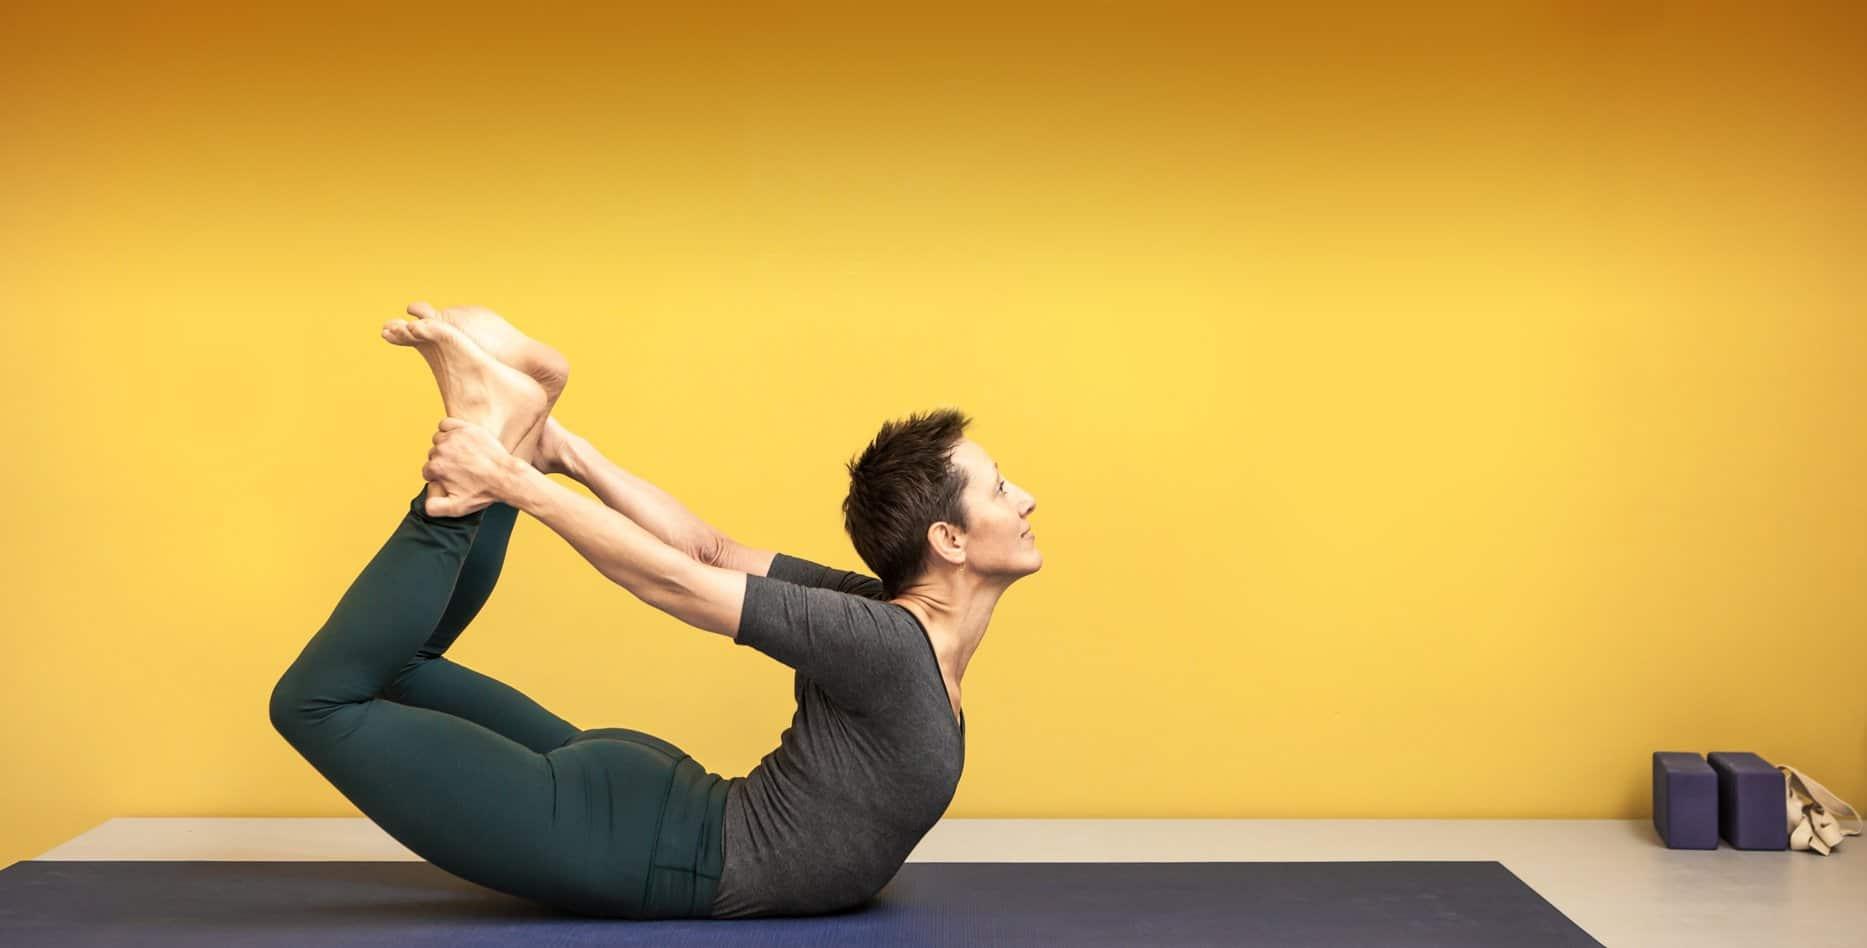 Kristien van Reusel yogahouding eigenaar en docent Yogaschool Amsterdam